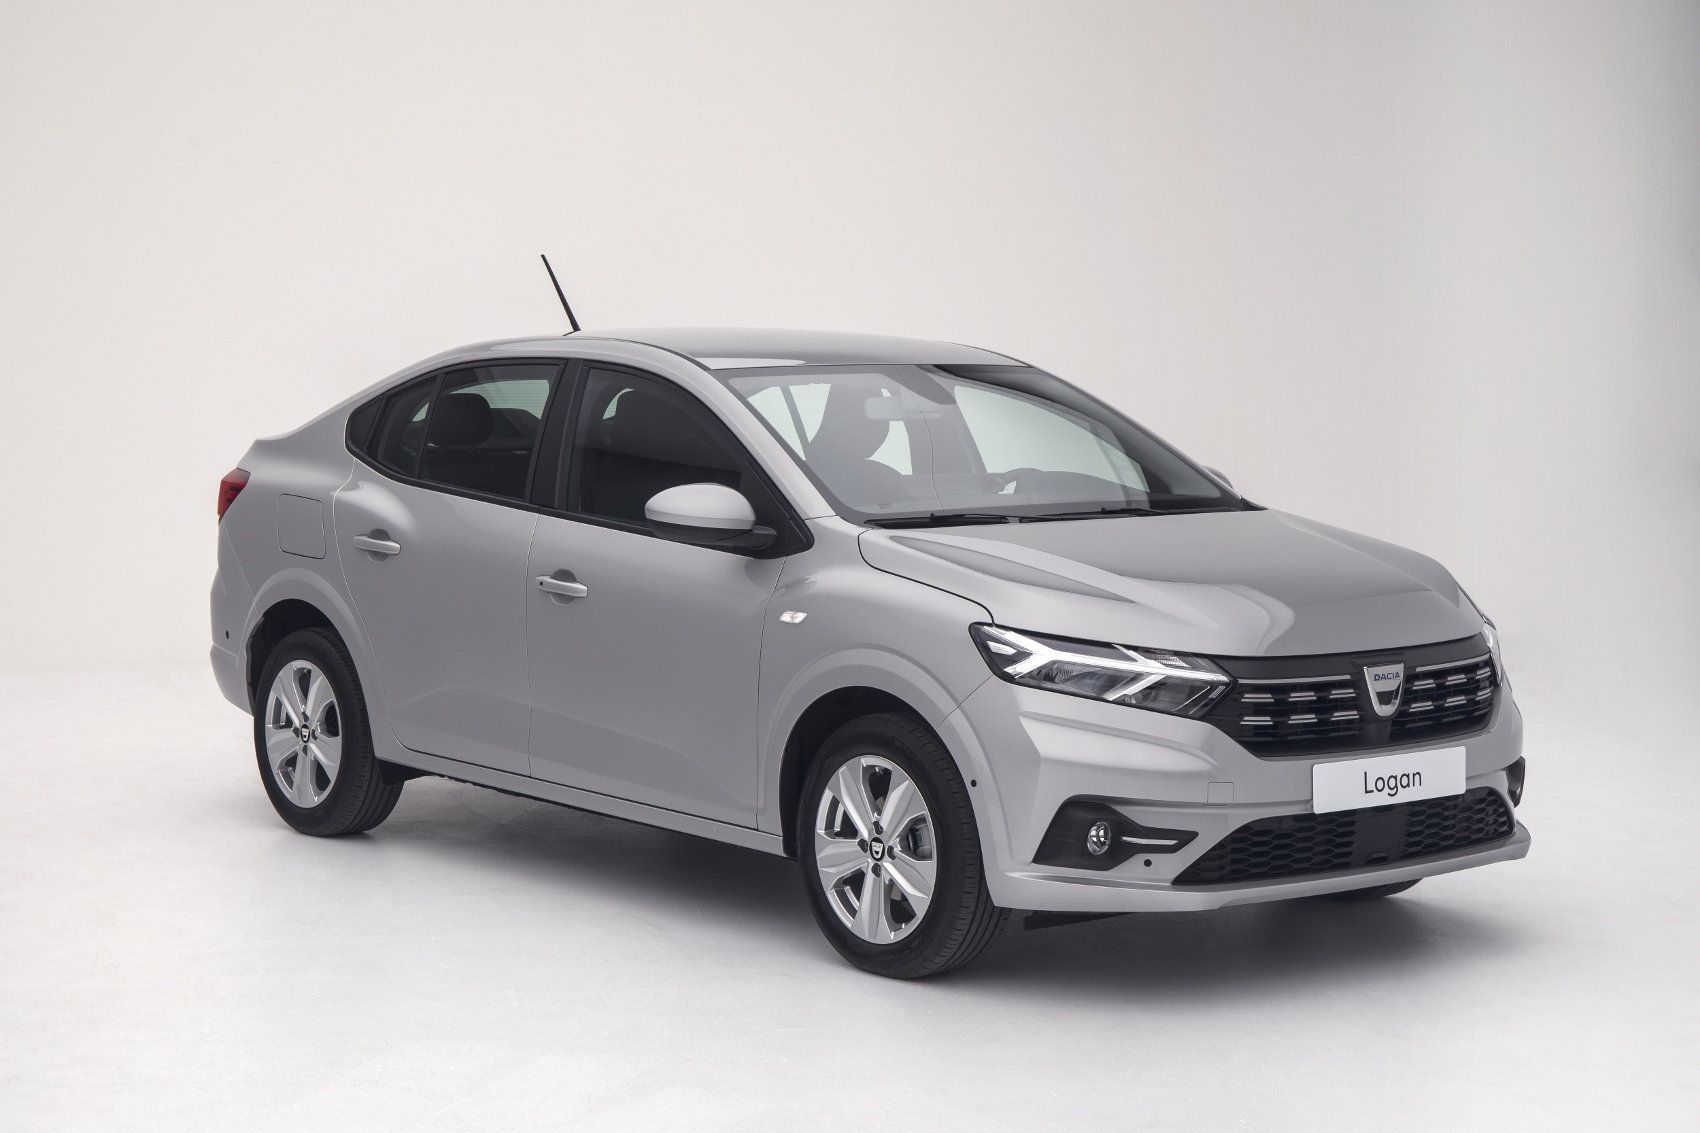 2020 - New Dacia LOGAN (3) (1700x1133)